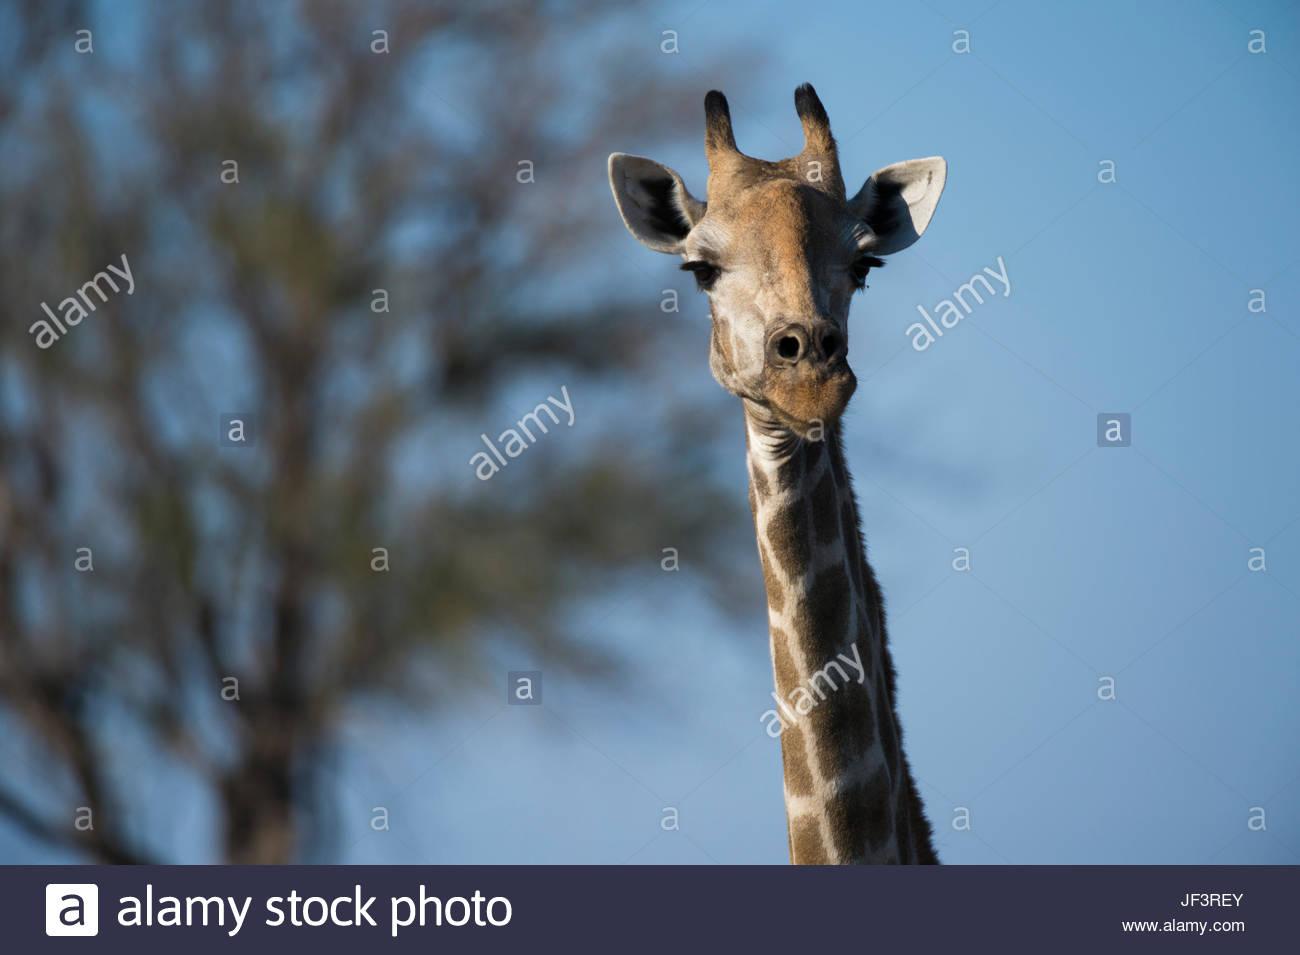 Portrait of a female southern giraffe, Giraffa camelopardalis giraffa, looking at the camera. - Stock Image